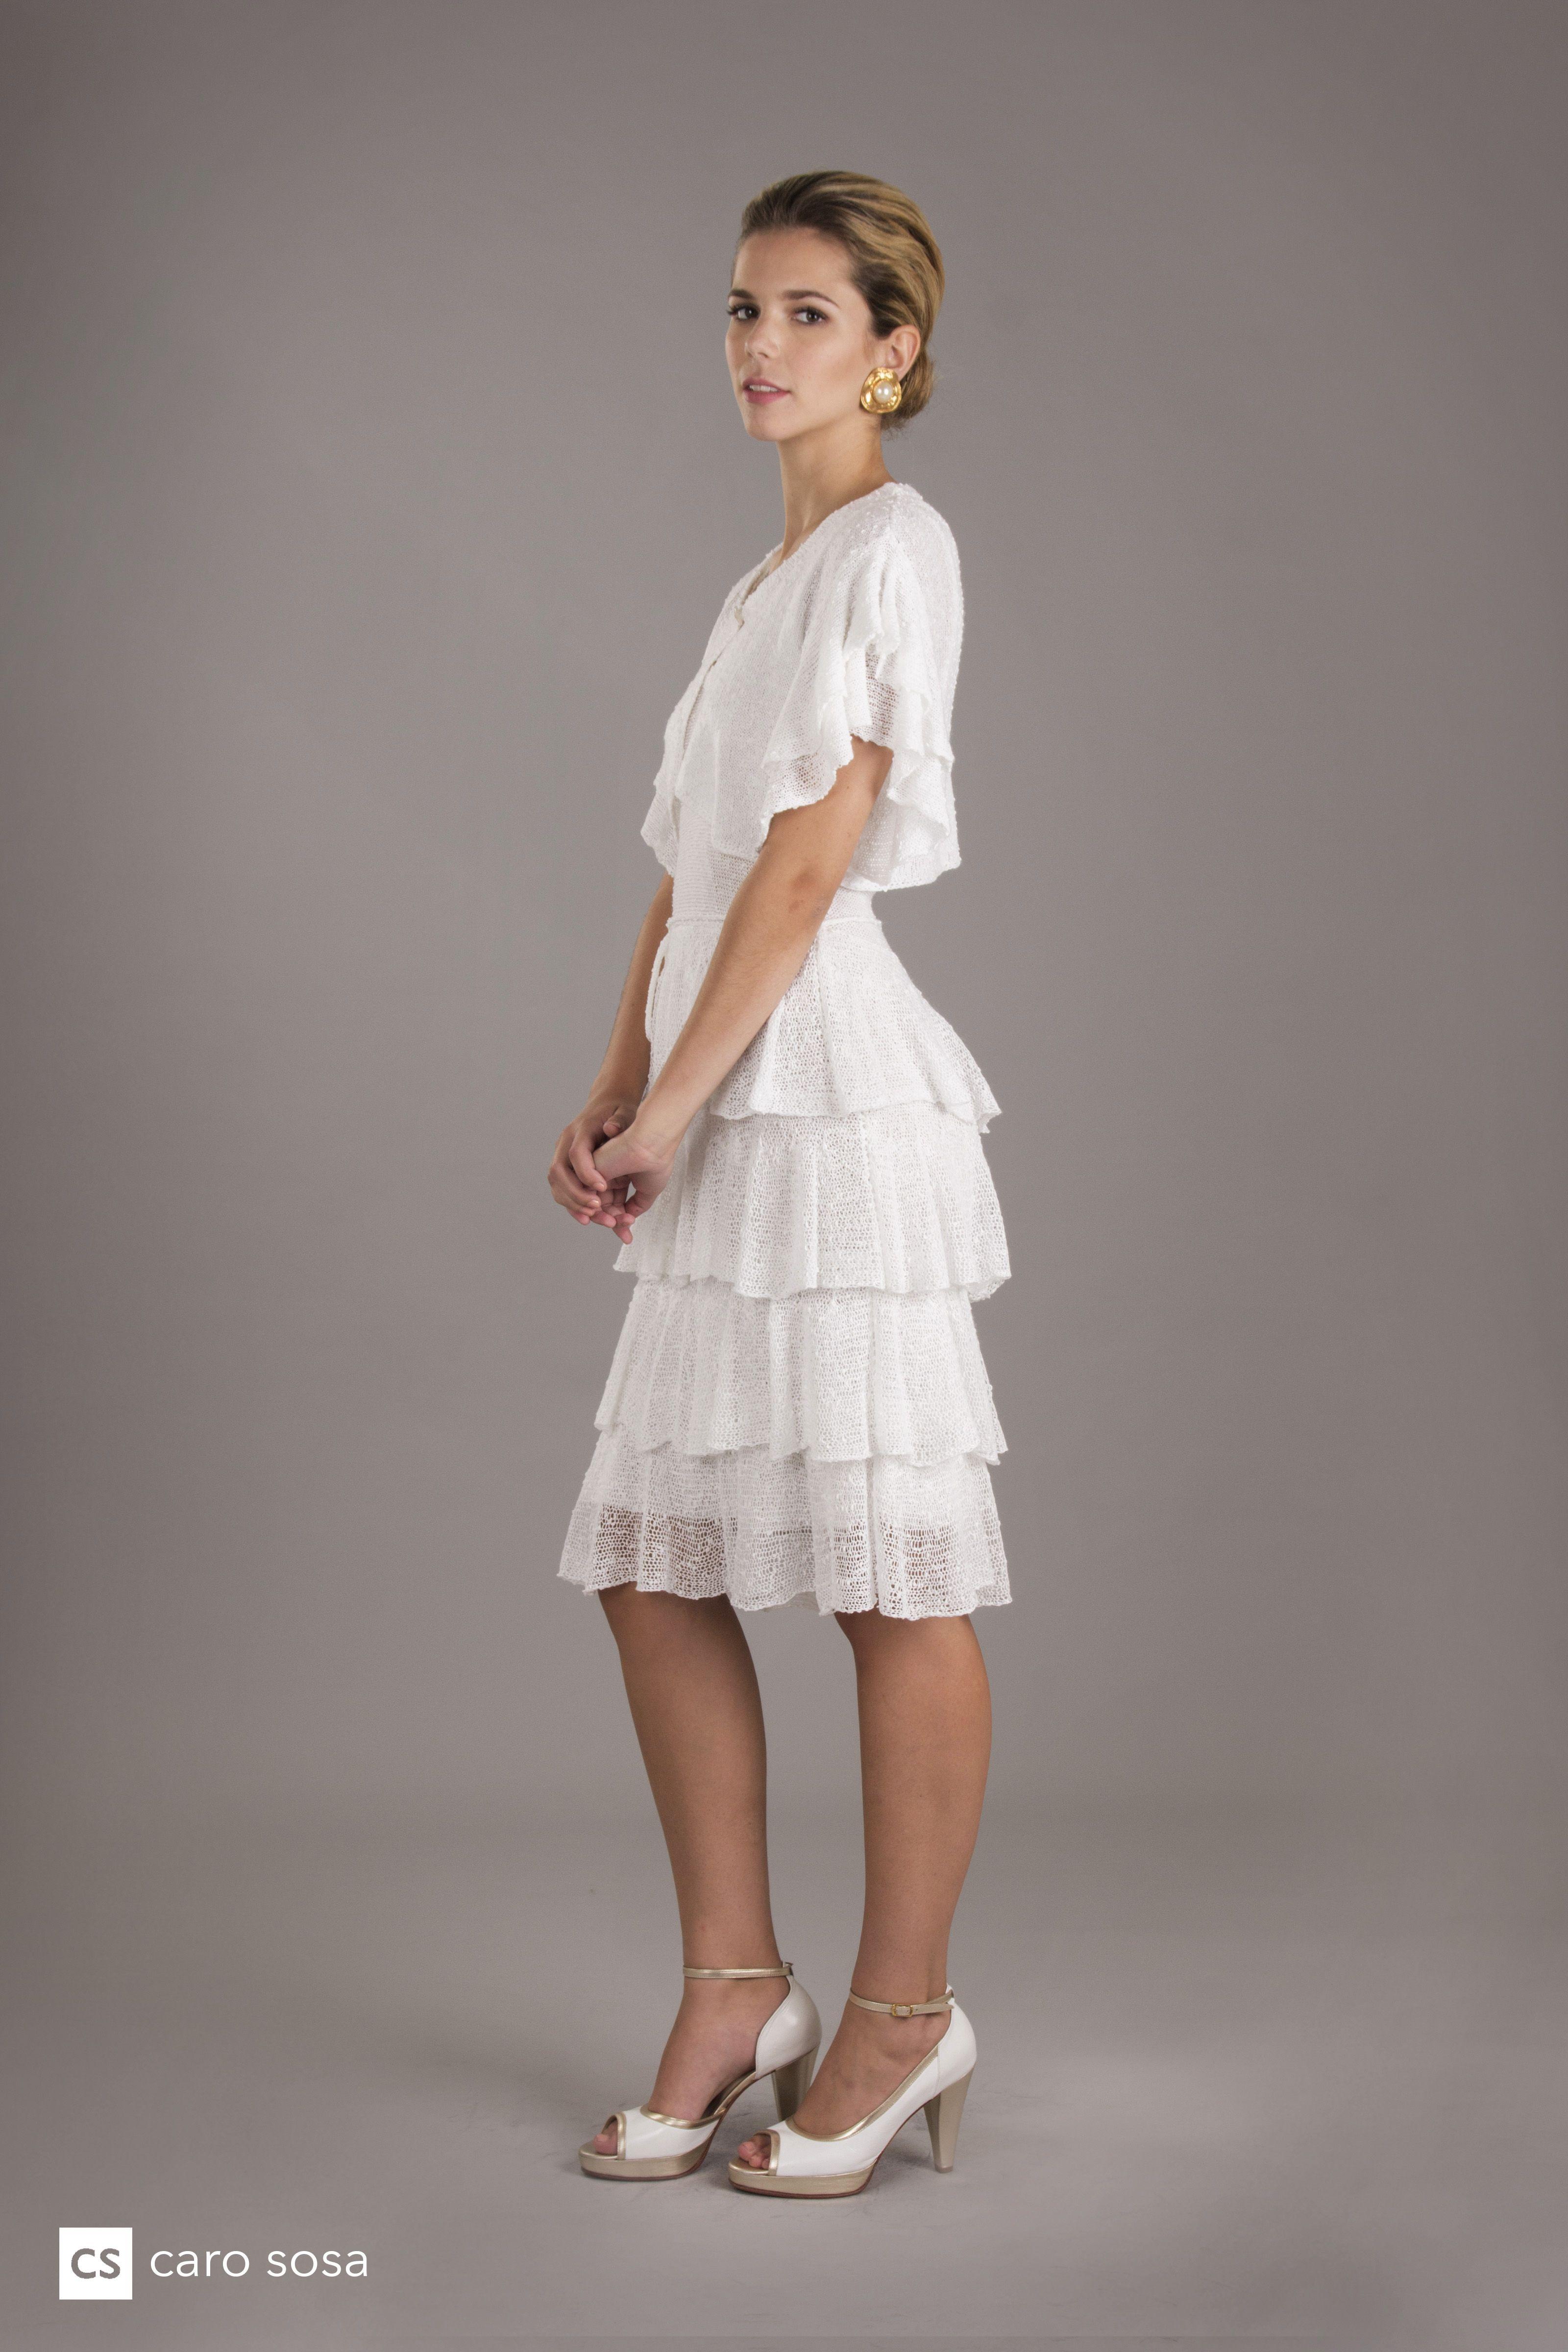 SWEET DRESS AW15-CARO SOSA WEDDING DRESS   Nueva Coleccion Invierno ...